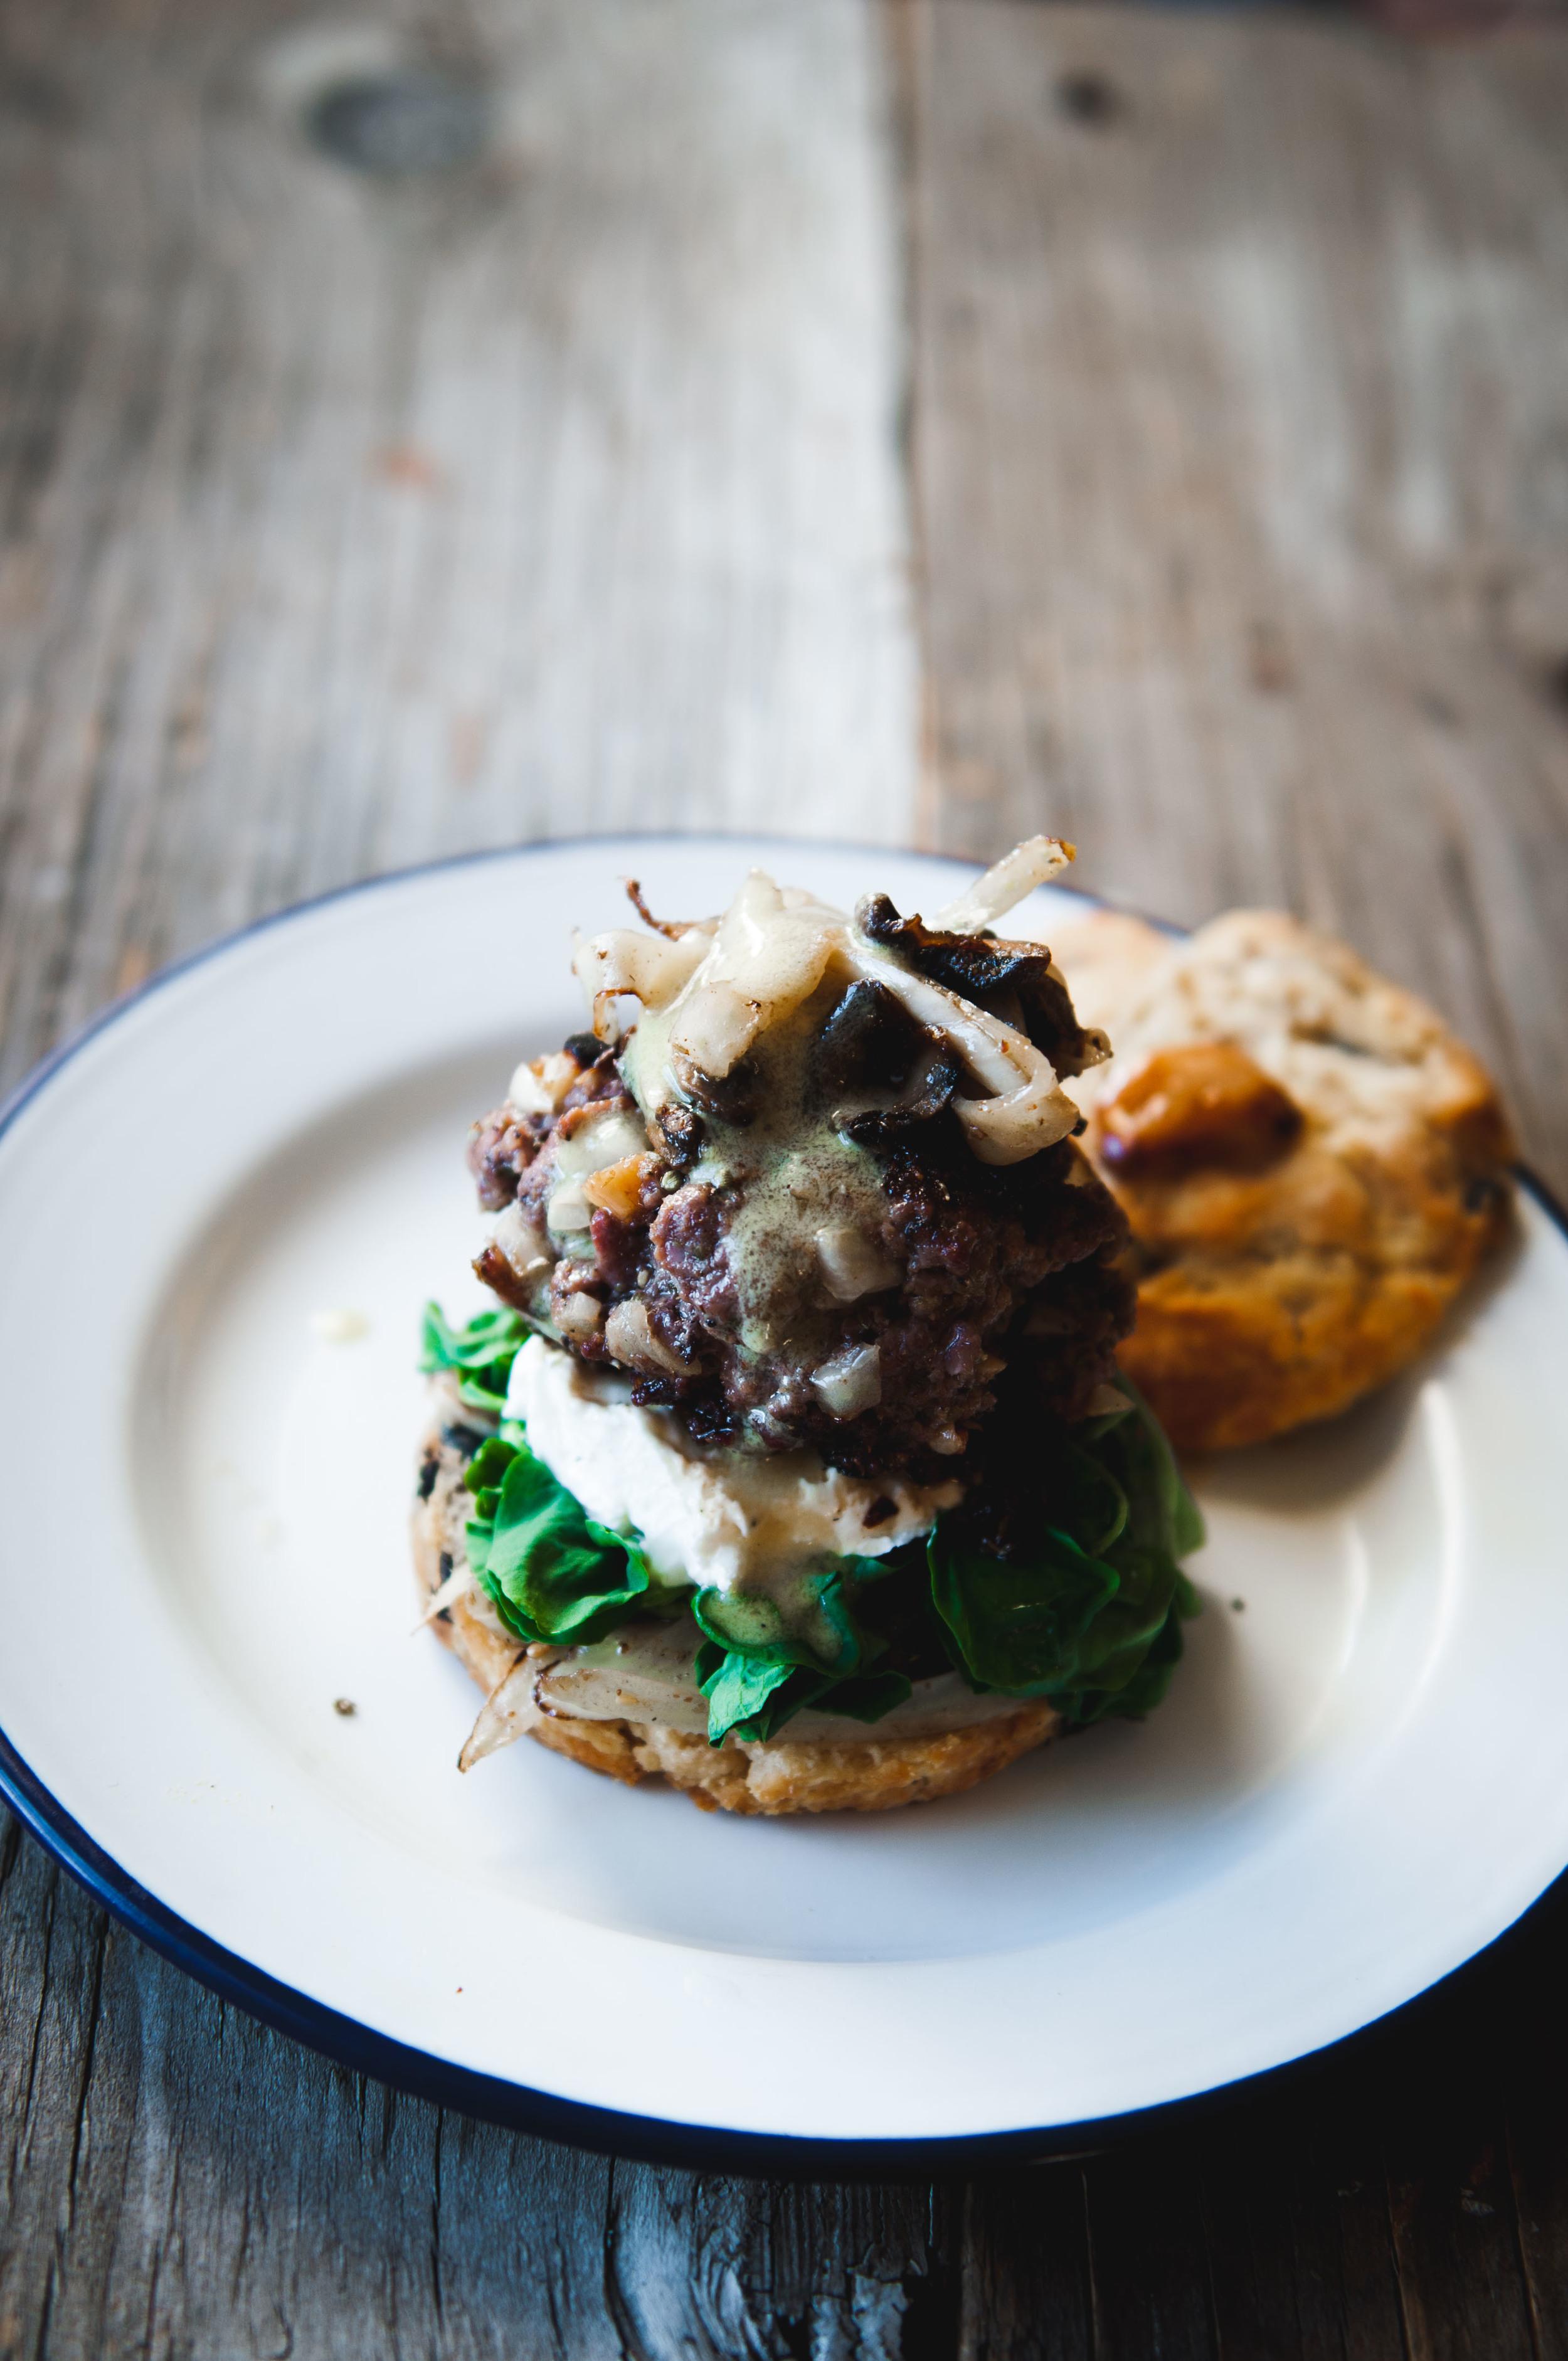 making-of-gluten-free-burger.jpg